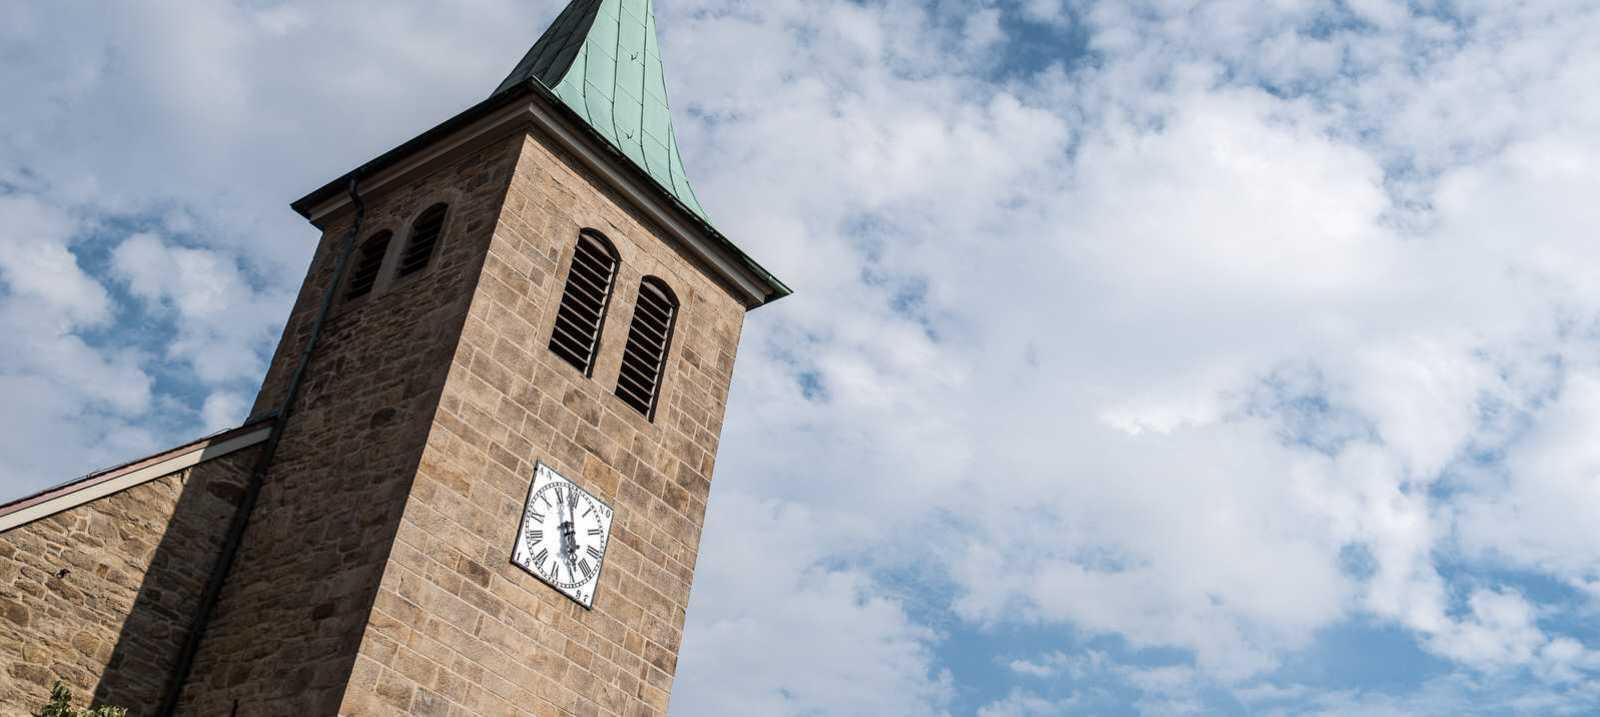 Kirche in Sprockhövel